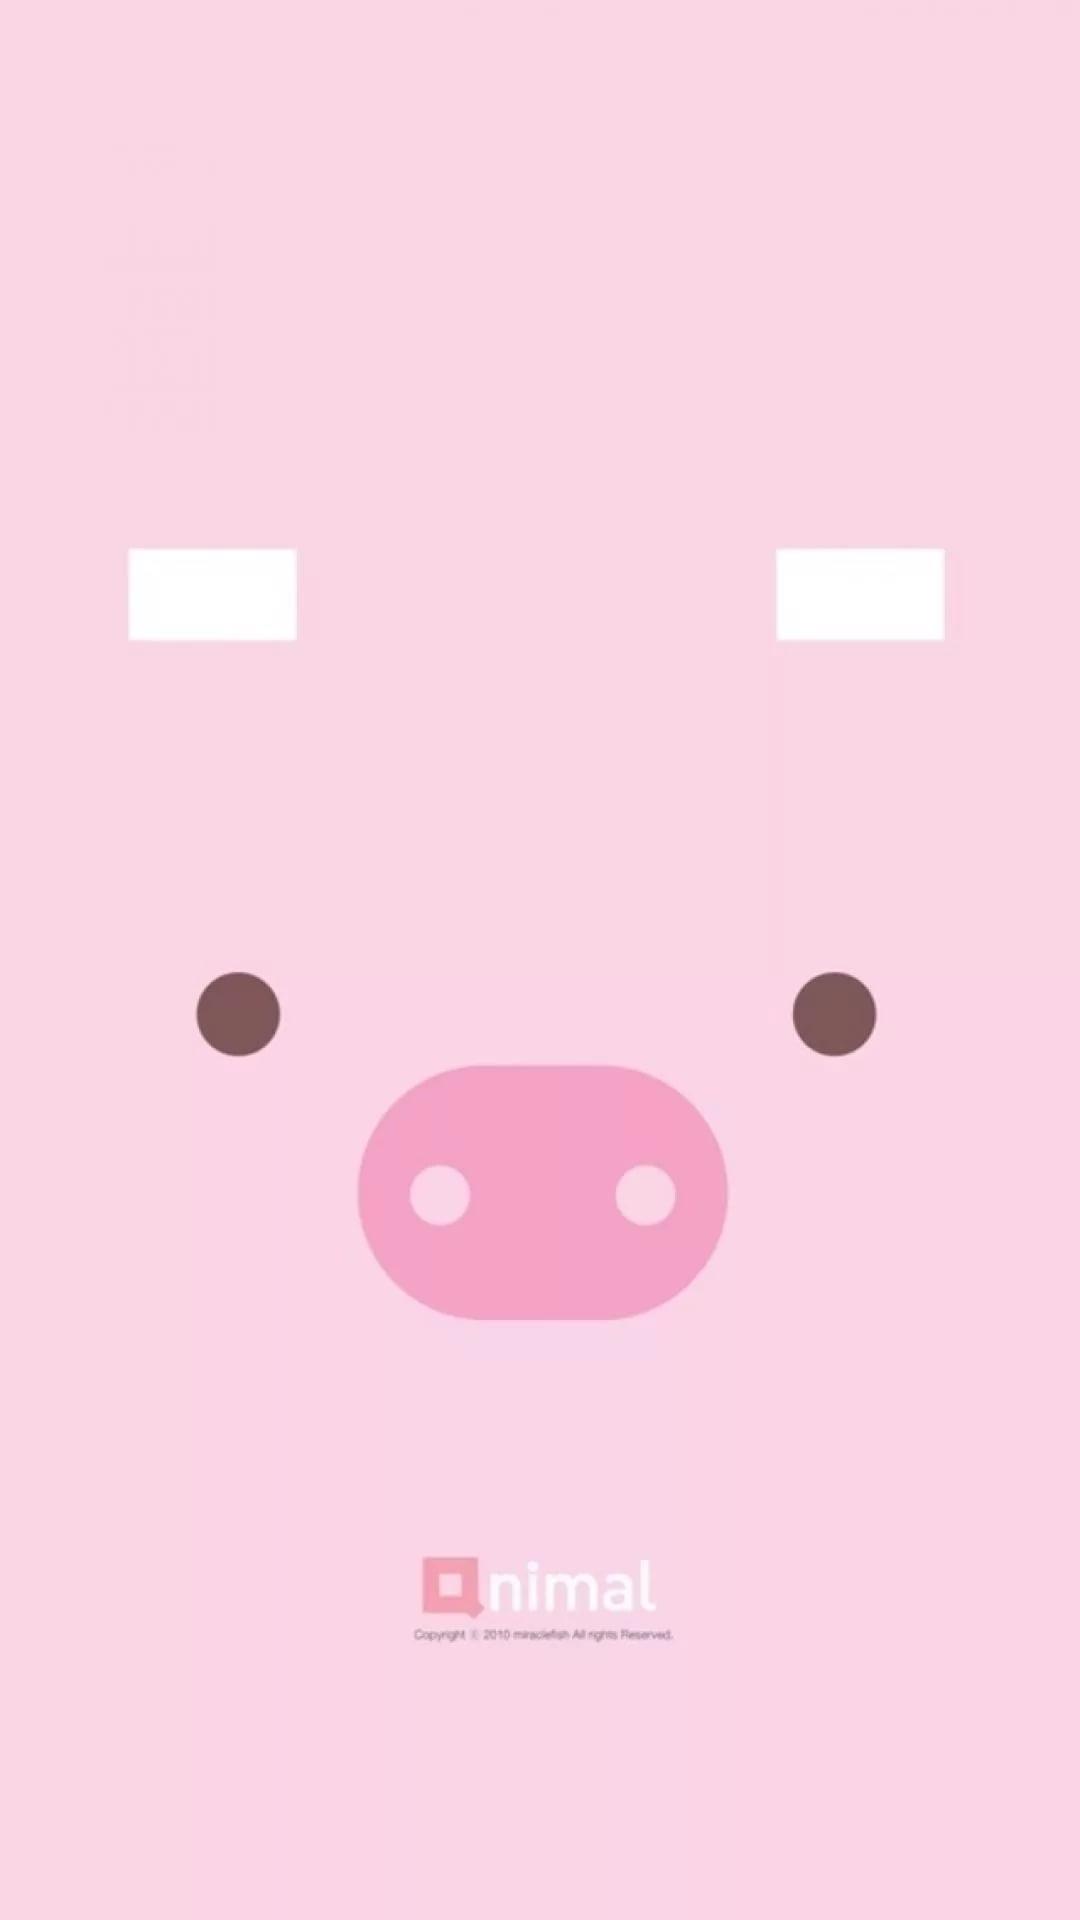 Cute iPhone 6 wallpaper